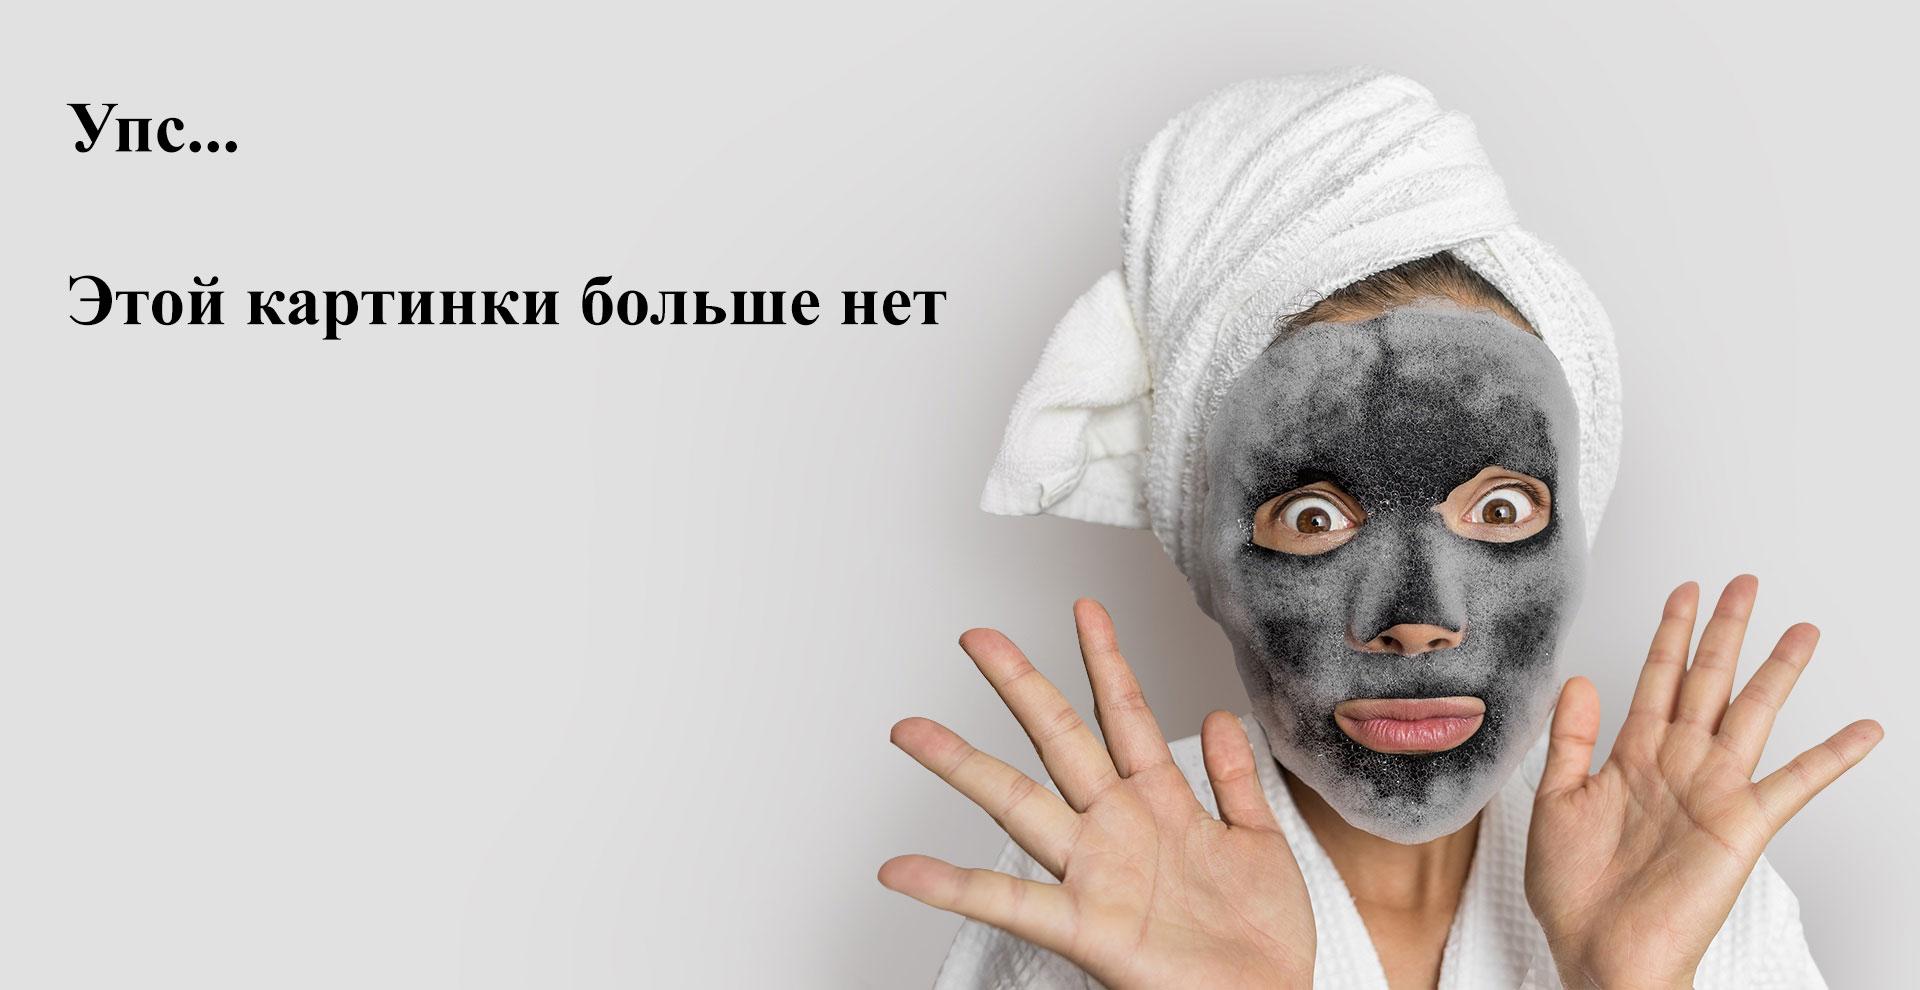 Vogue Nails, Гель-лак Глазурь